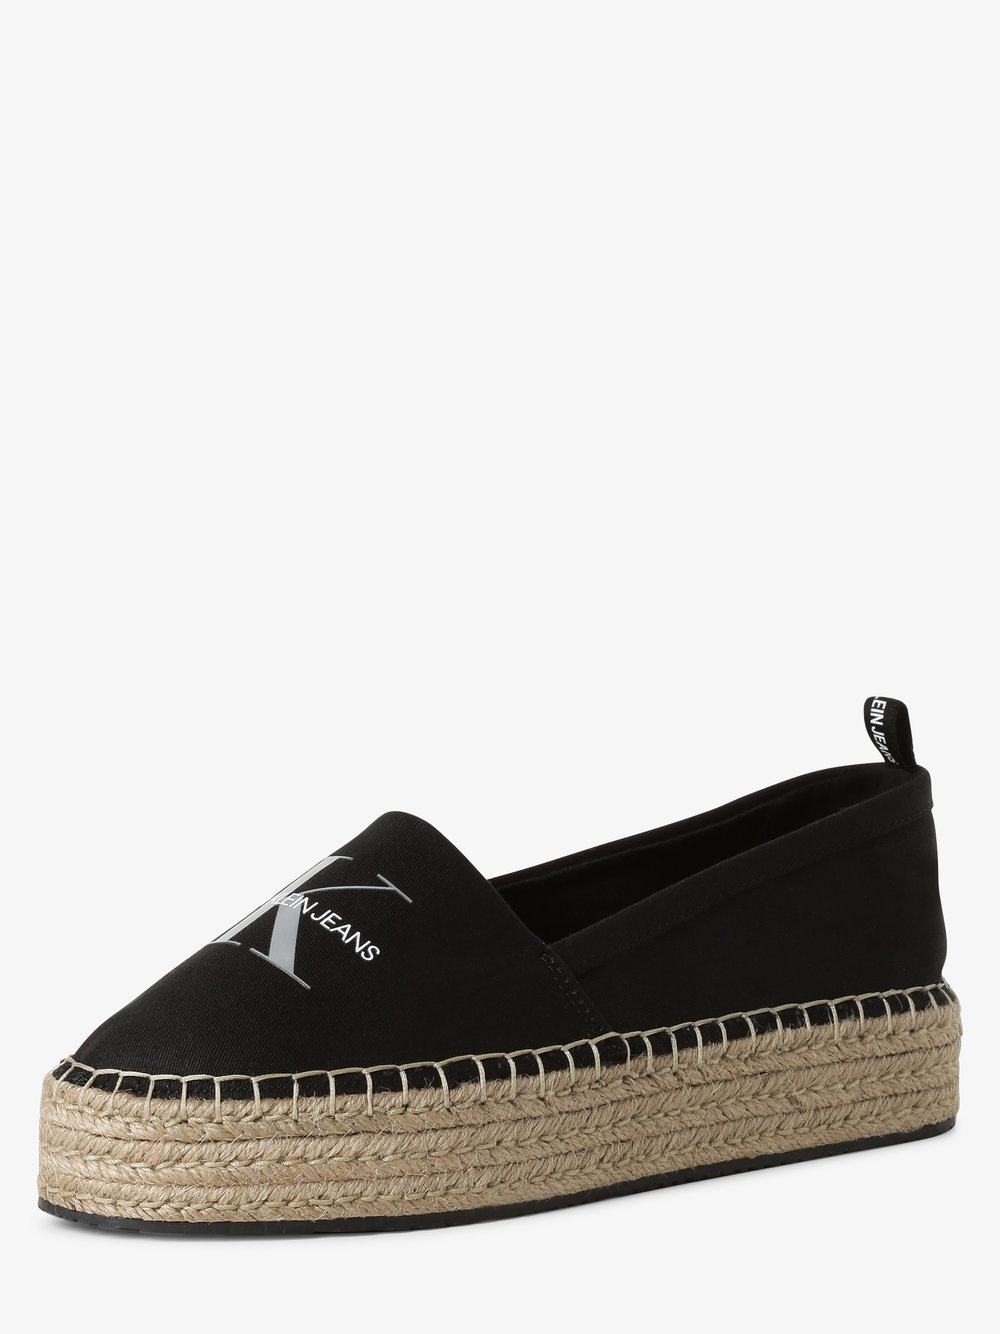 Calvin Klein Jeans - Espadryle damskie, czarny